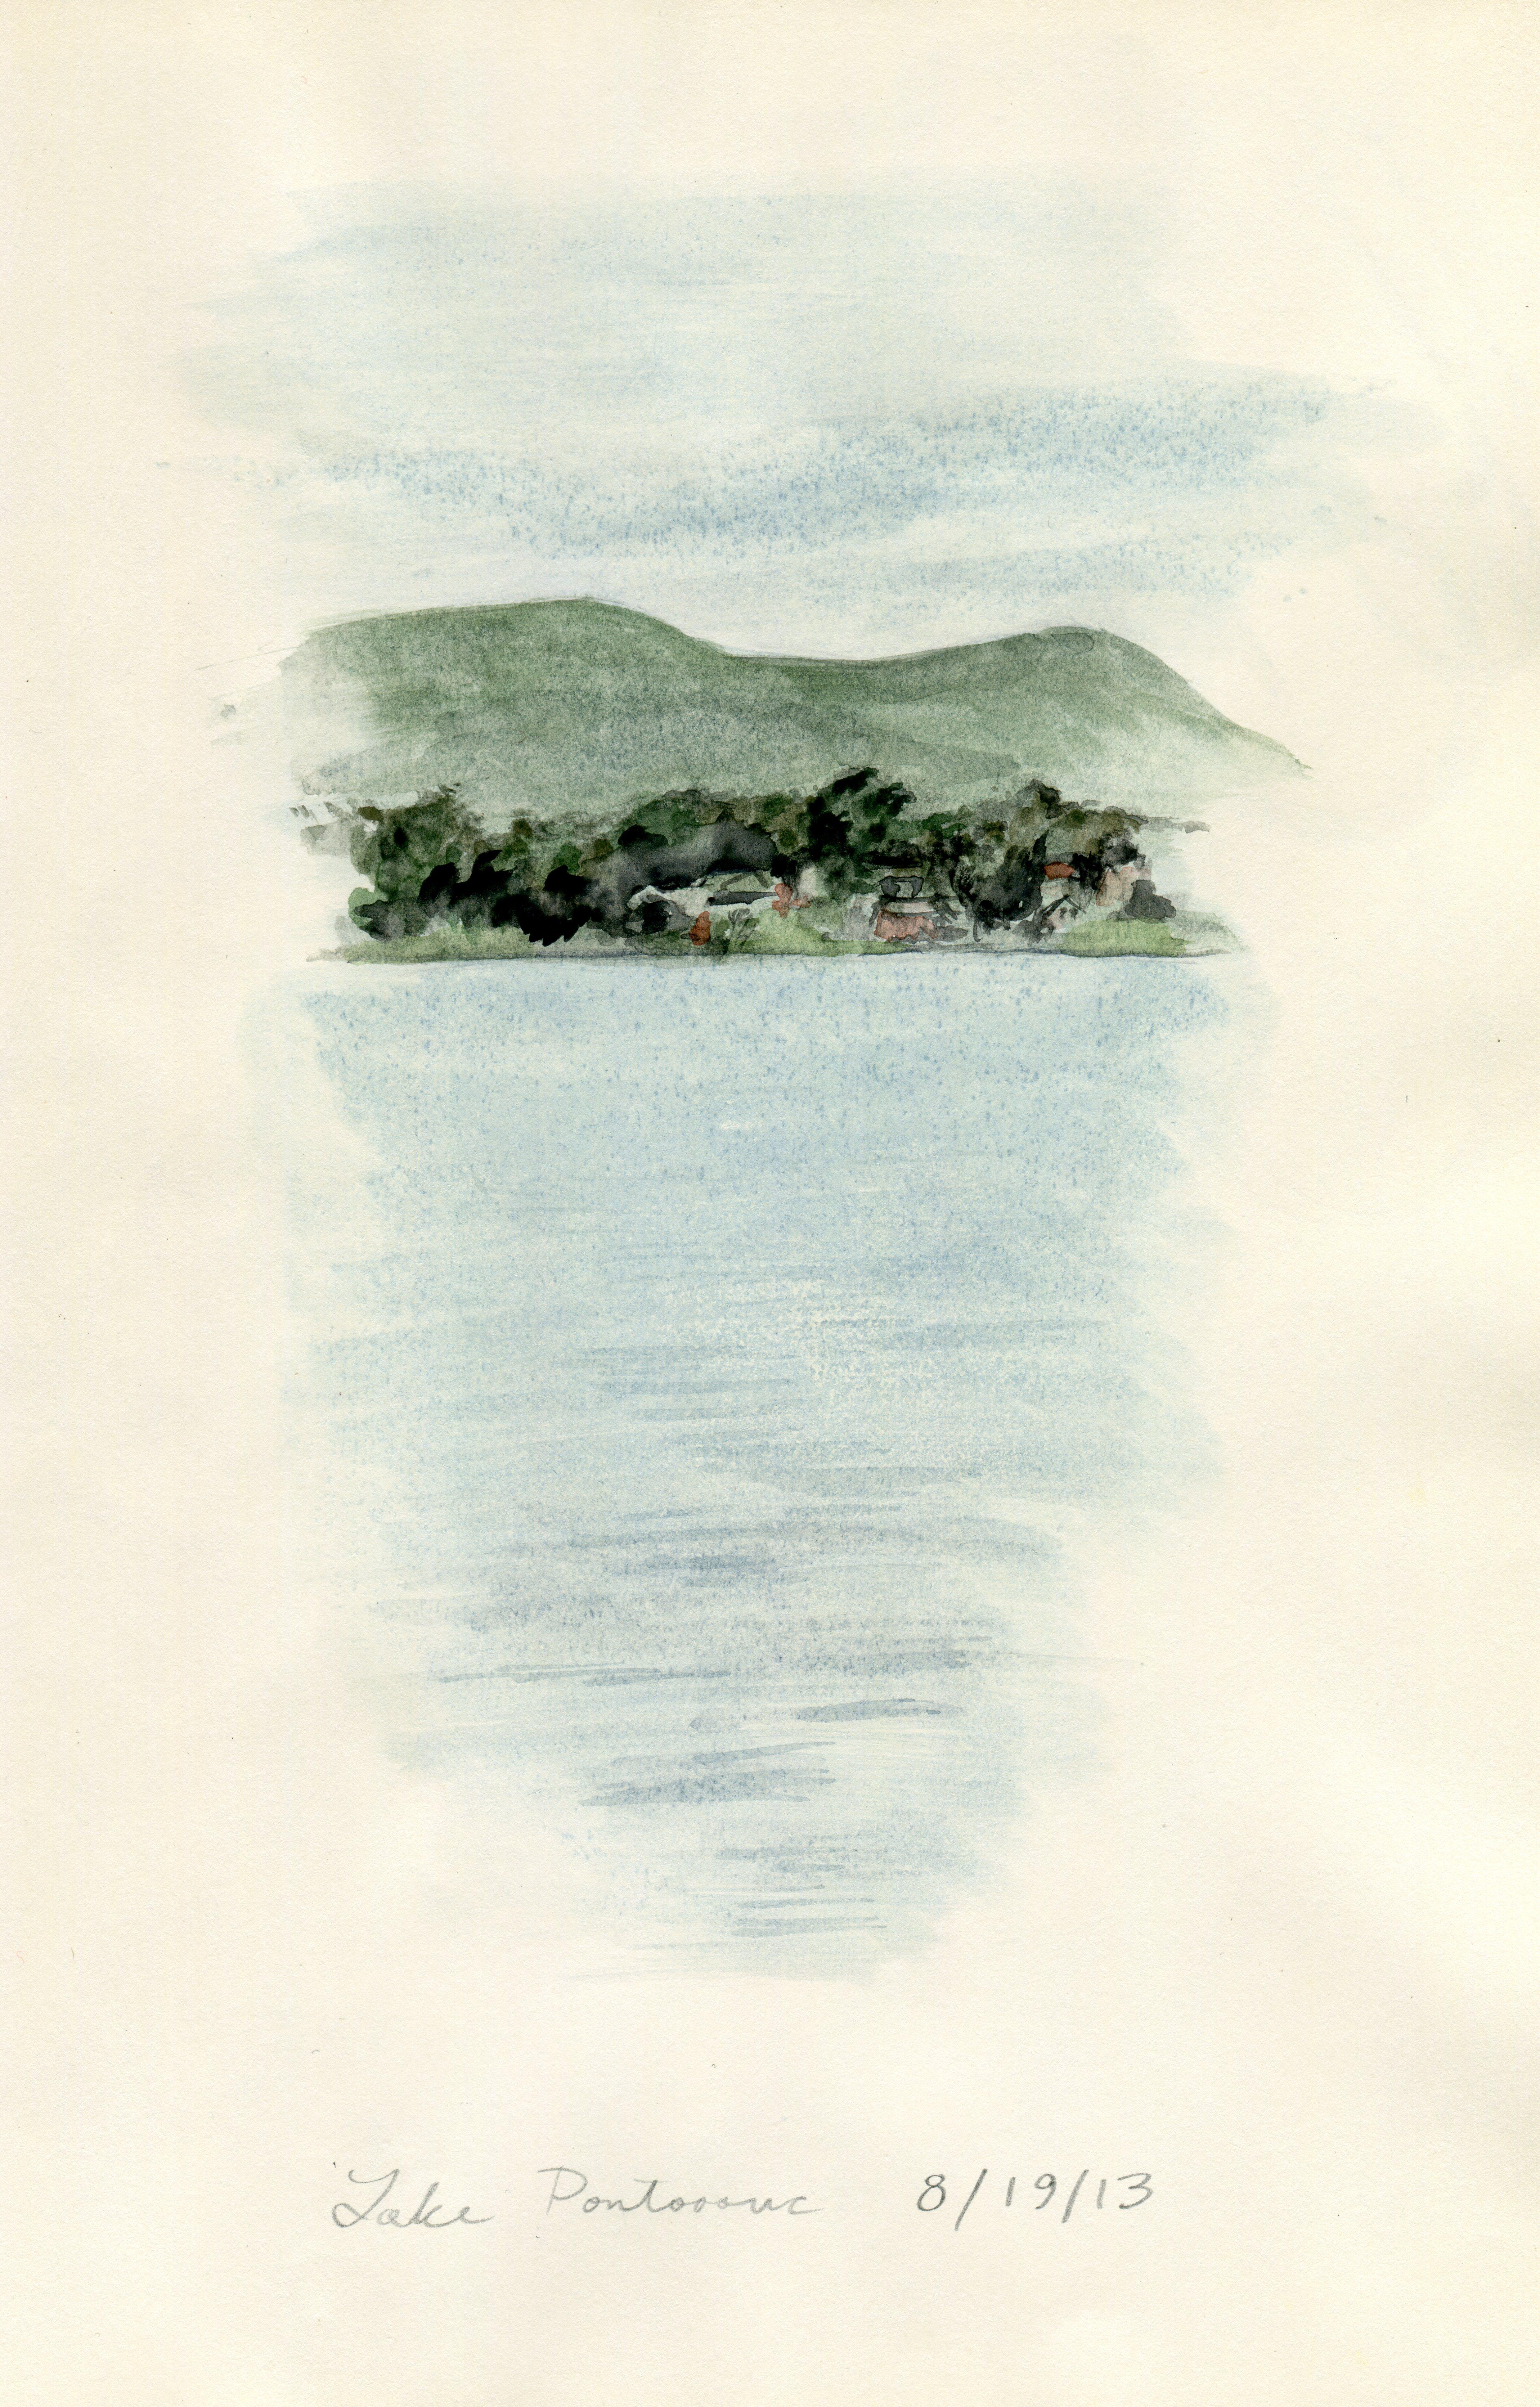 Lake Pontoosuc